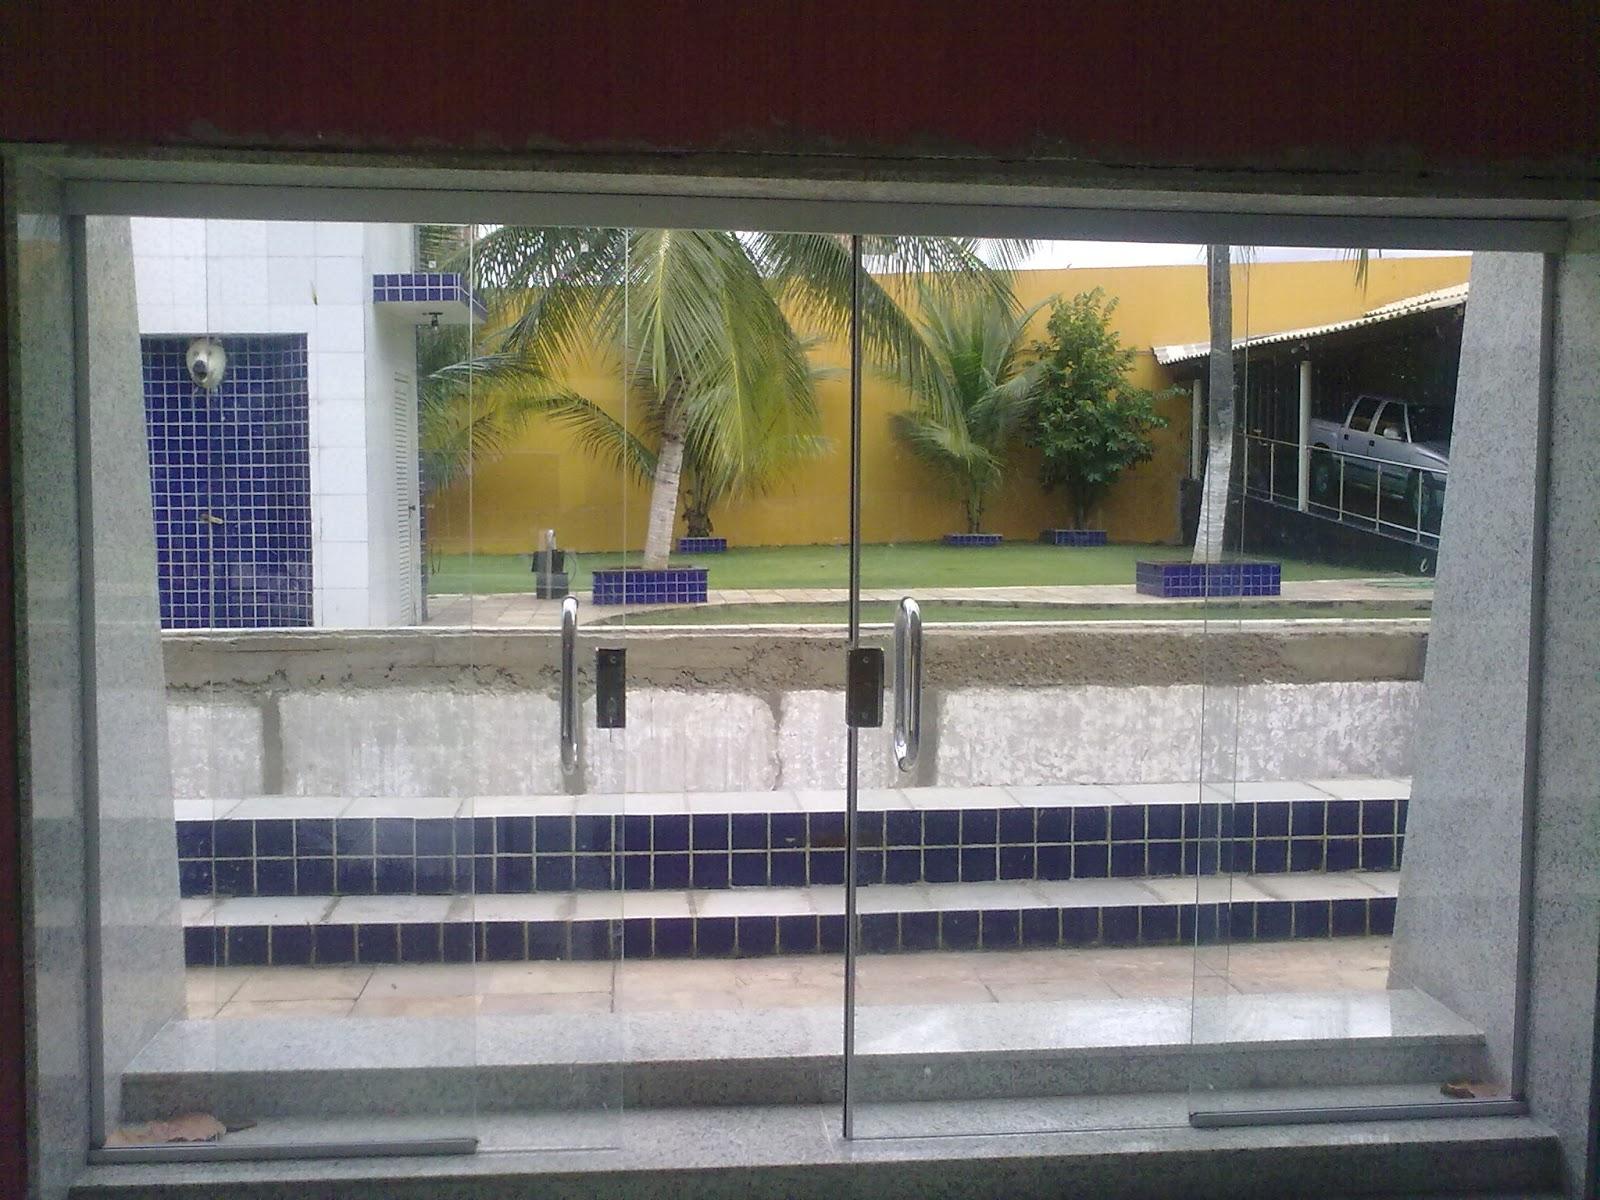 #8C713F PORTA CORREDIÇA 04 FOLHAS EM VIDRO TEMPERADO INCOLOR 384 Janelas De Vidro Valor